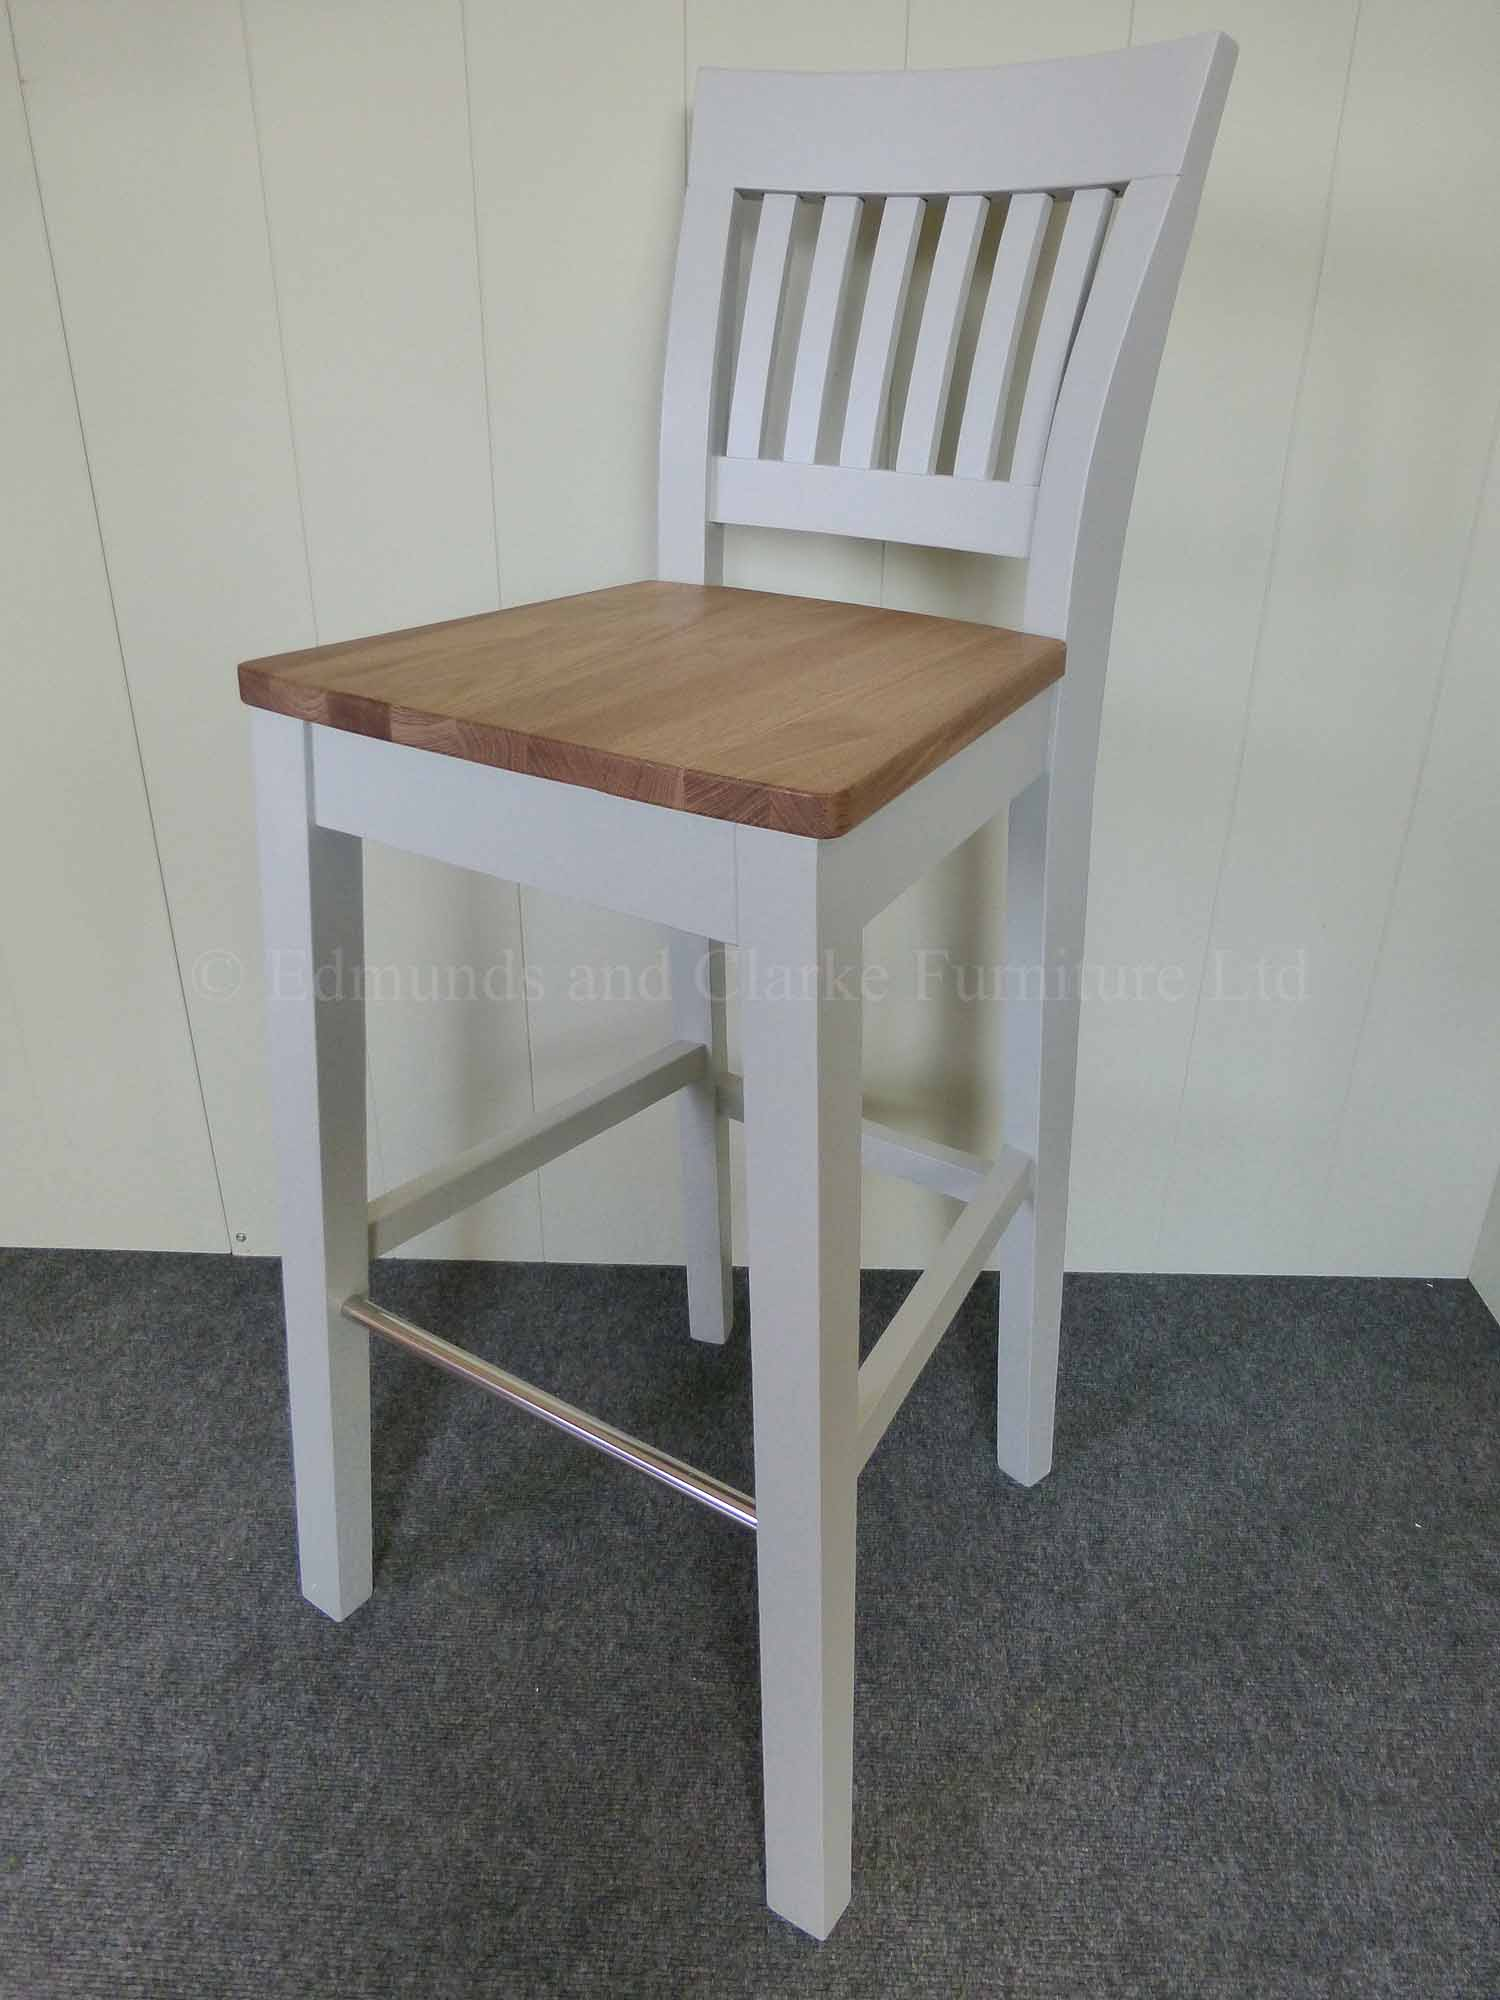 Grey painted linden high breakfast bar stool